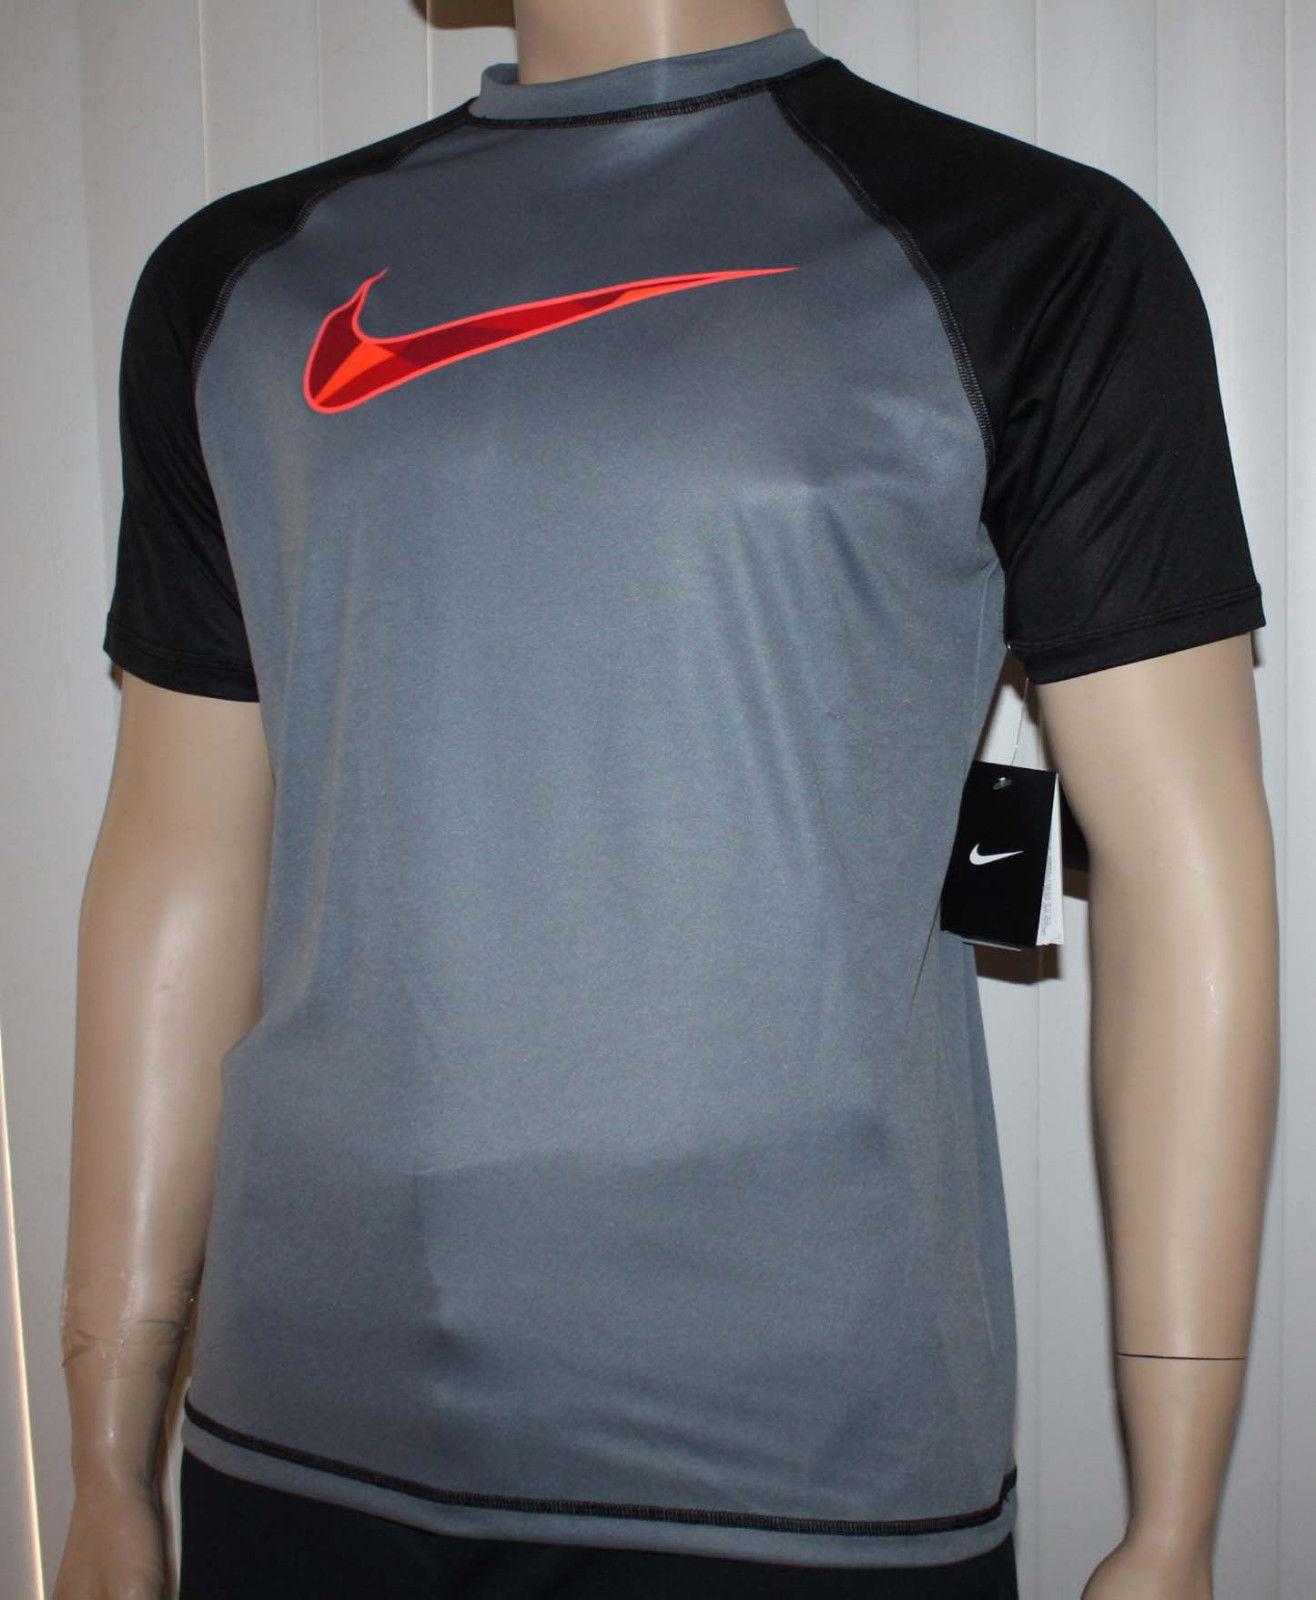 Nike Men's Dri-Fit Gray/Black Checked Swoosh UPF 40 + Shirt -Small 11047